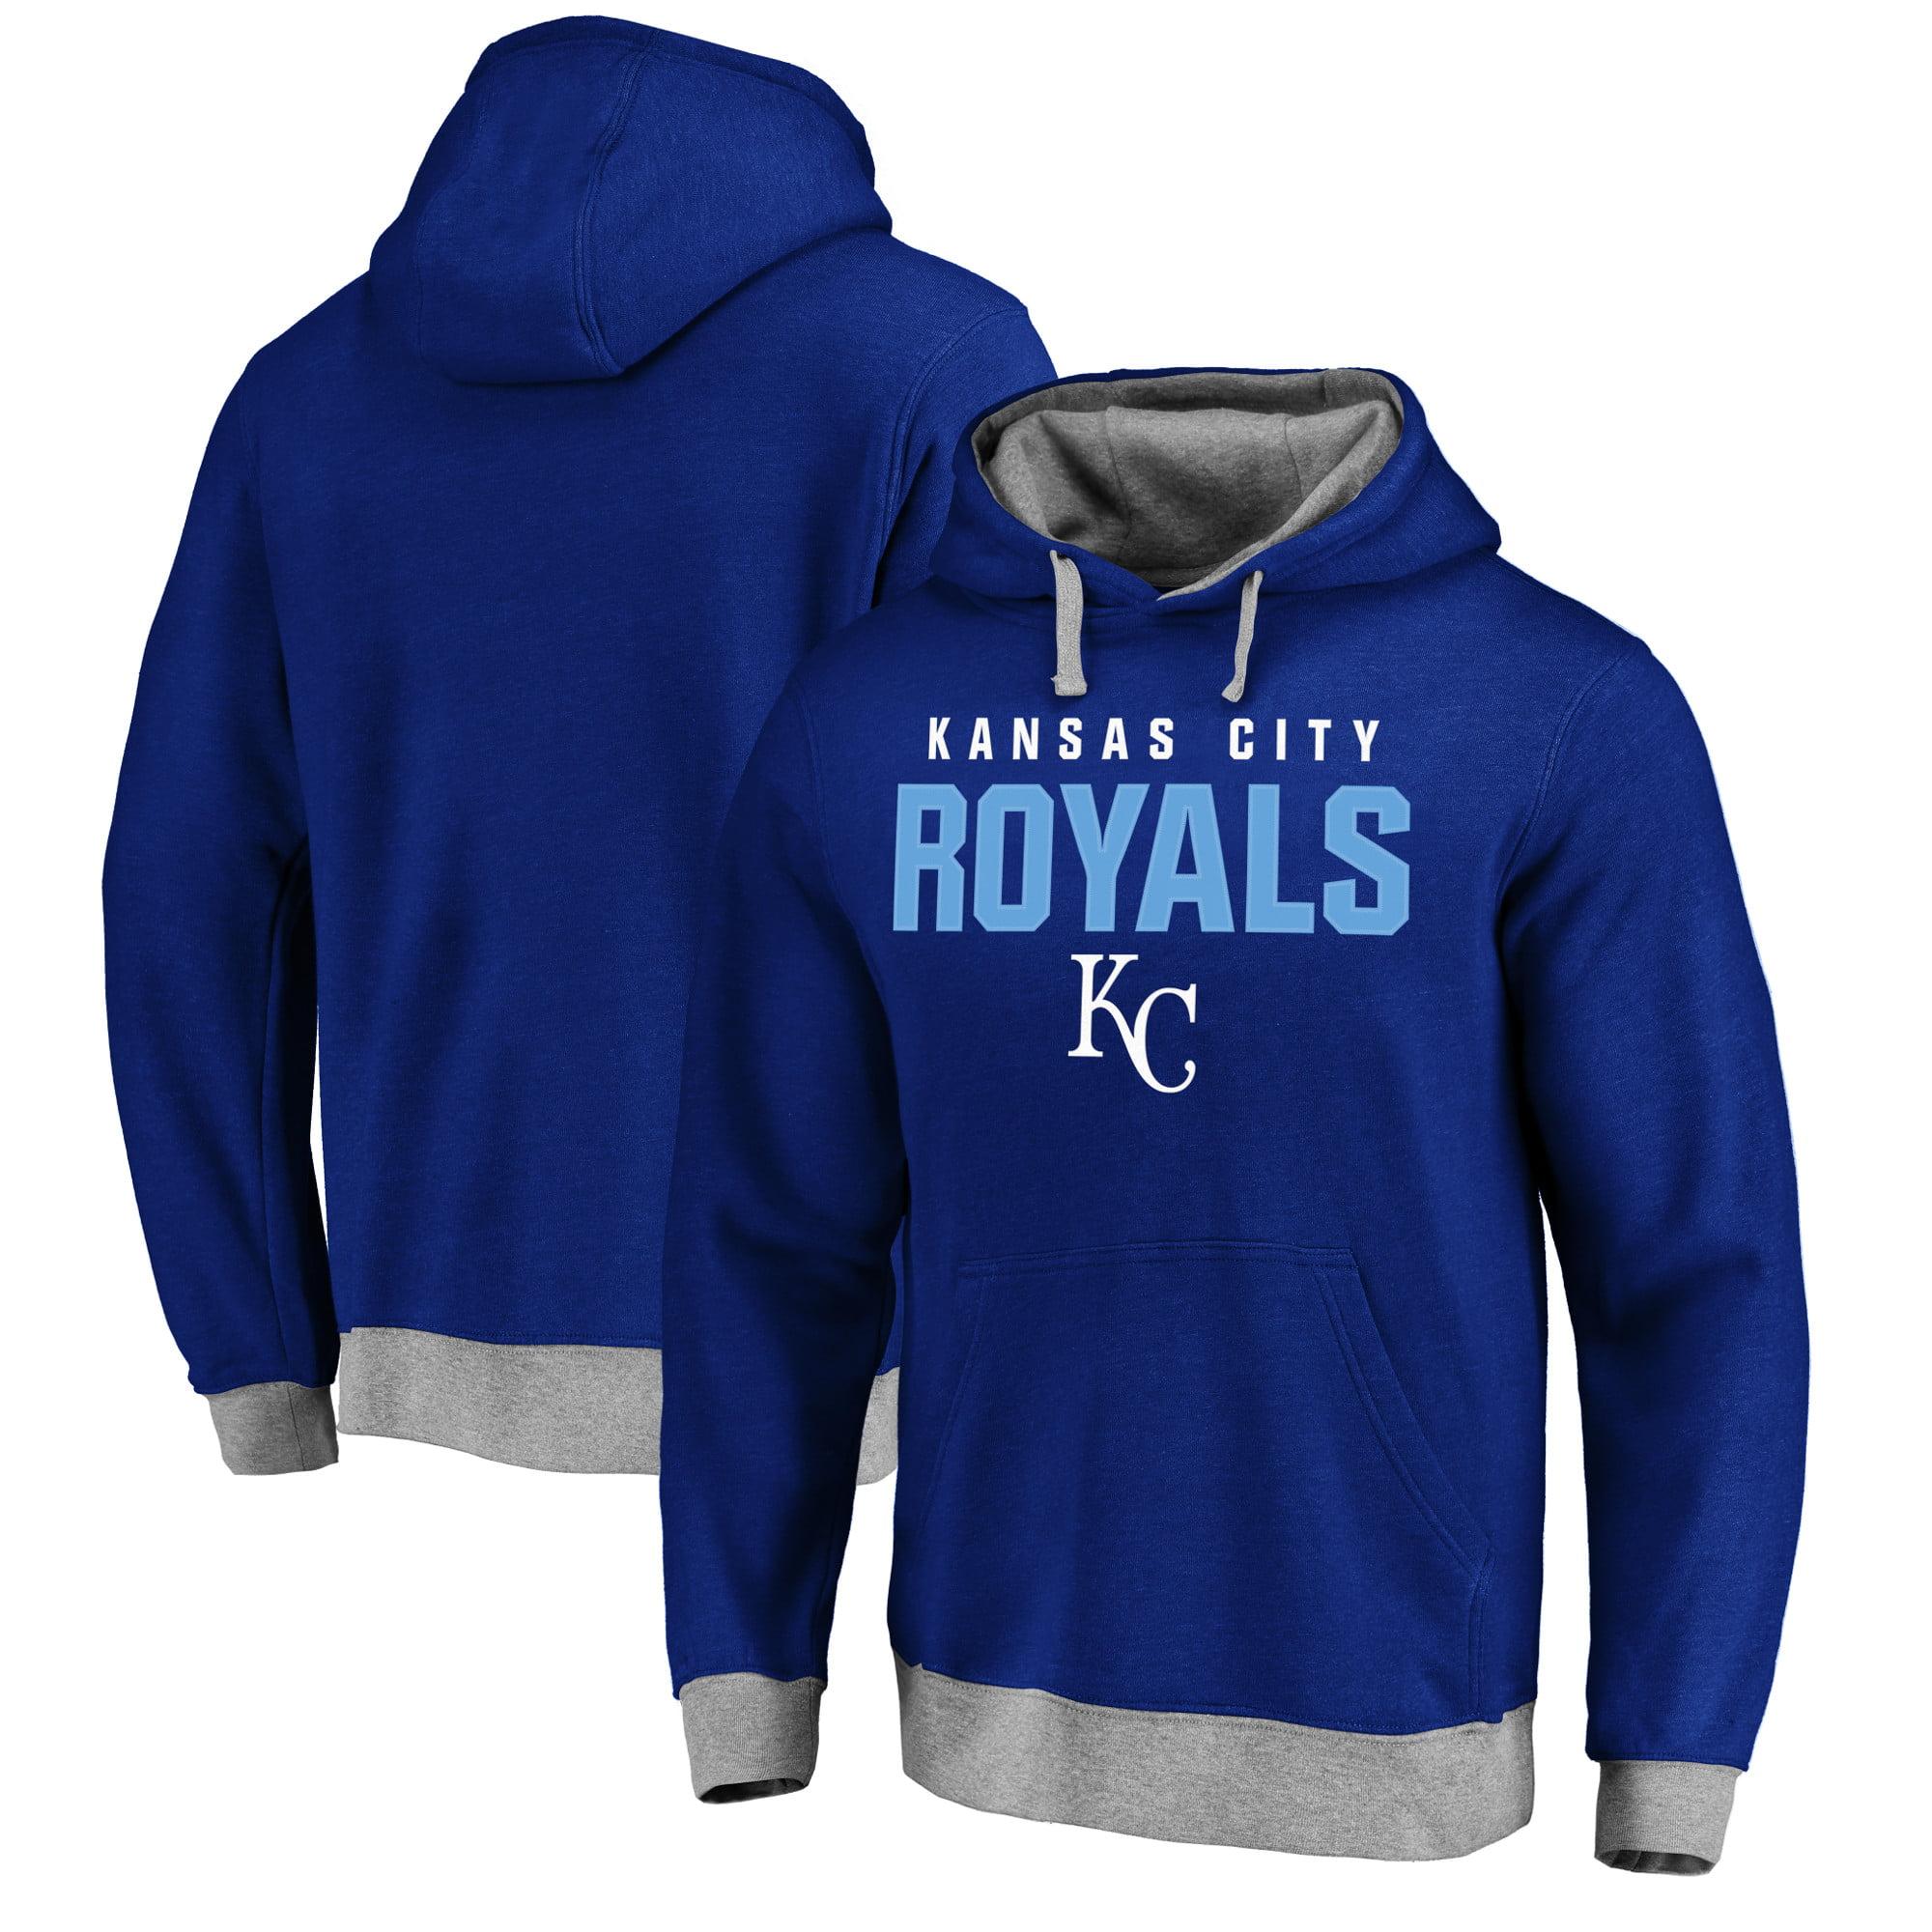 Kansas City Royals Elevation Tri-Blend Pullover Fleece Hoodie - Royal